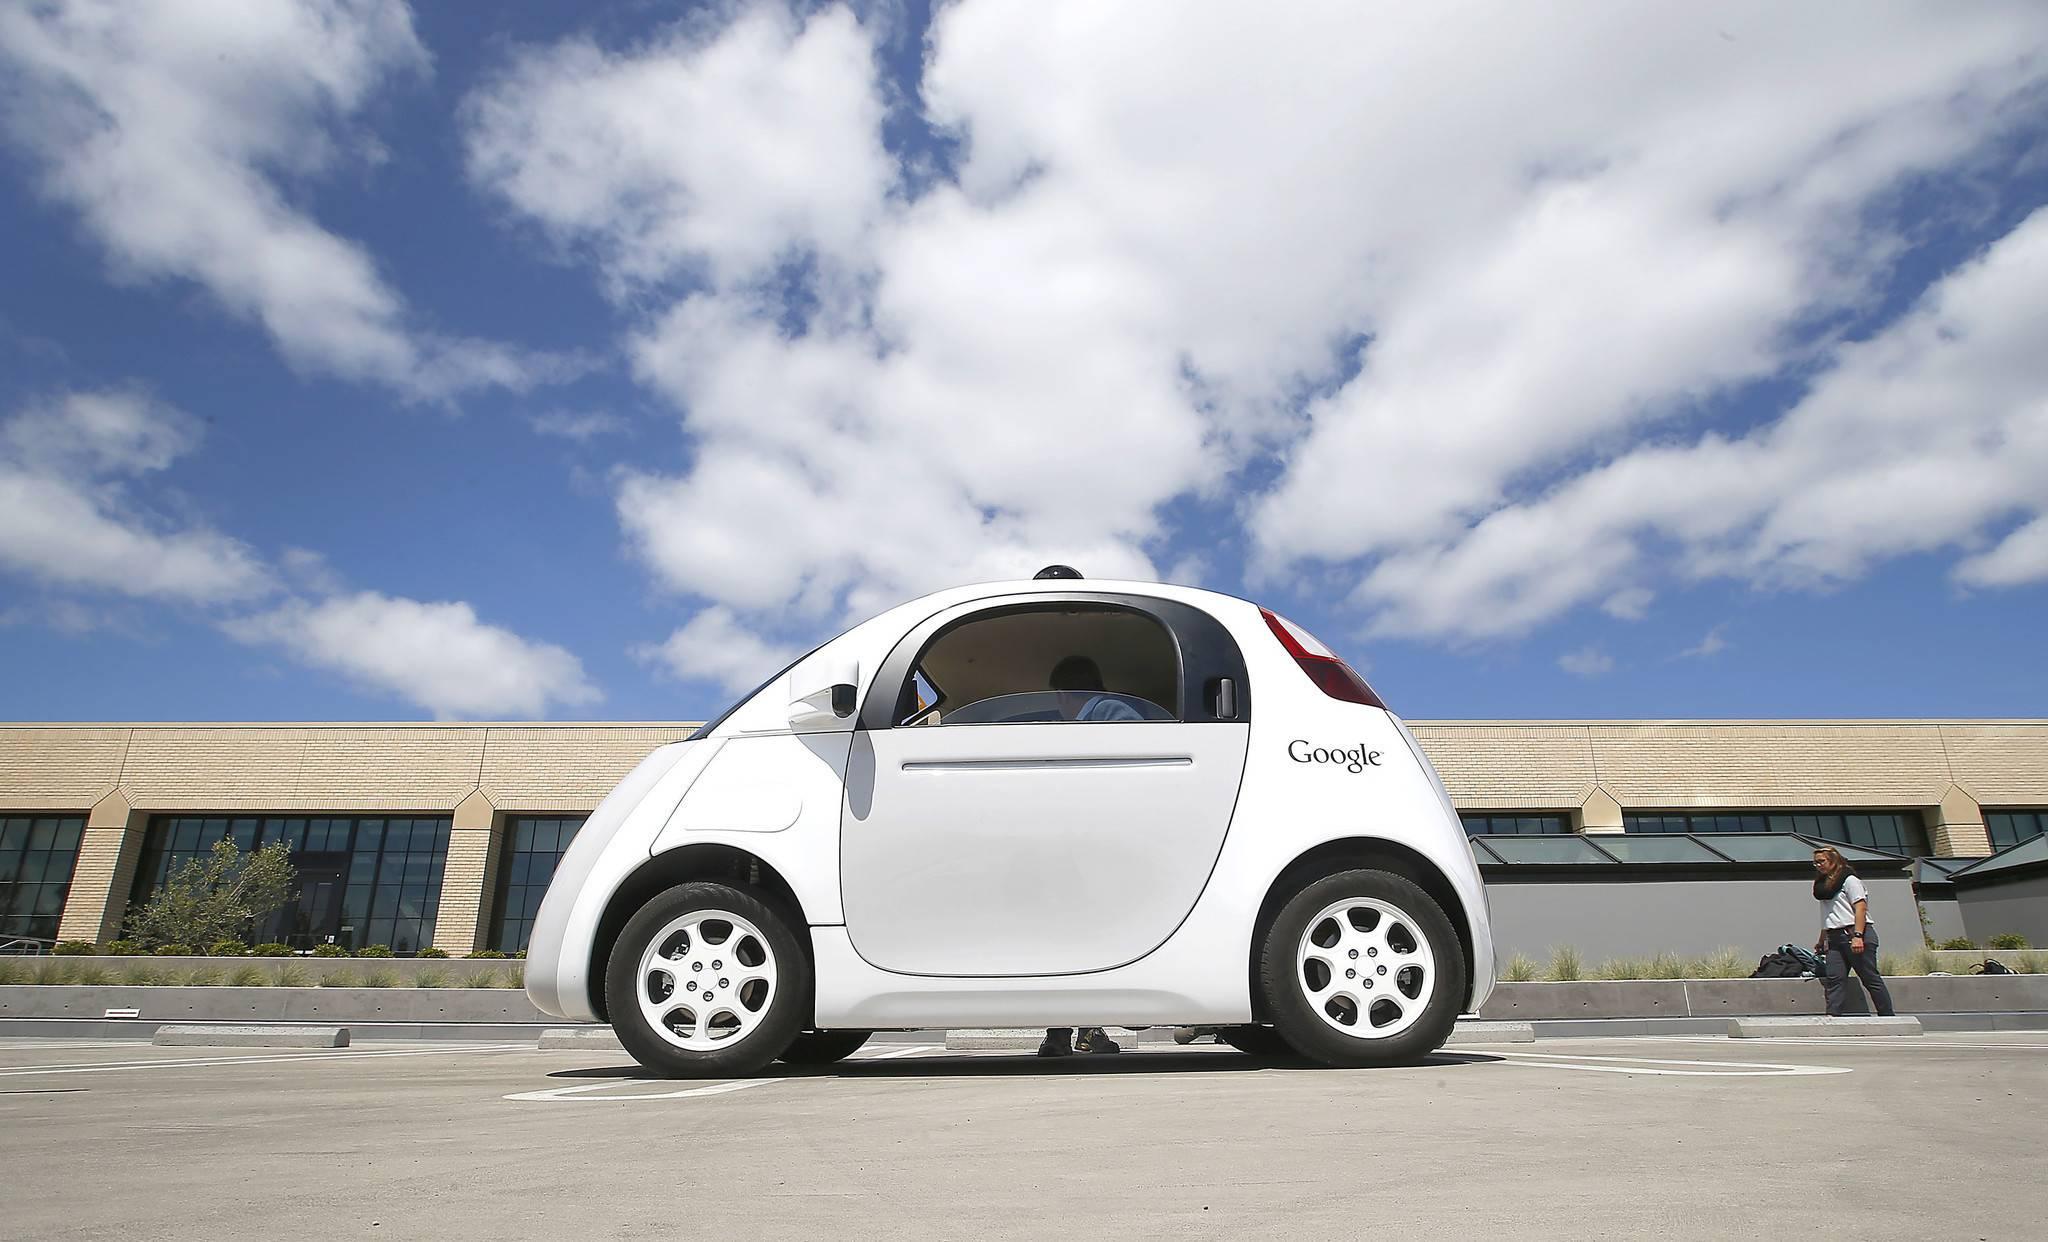 la-fi-hy-google-self-driving-car-tests-20150515